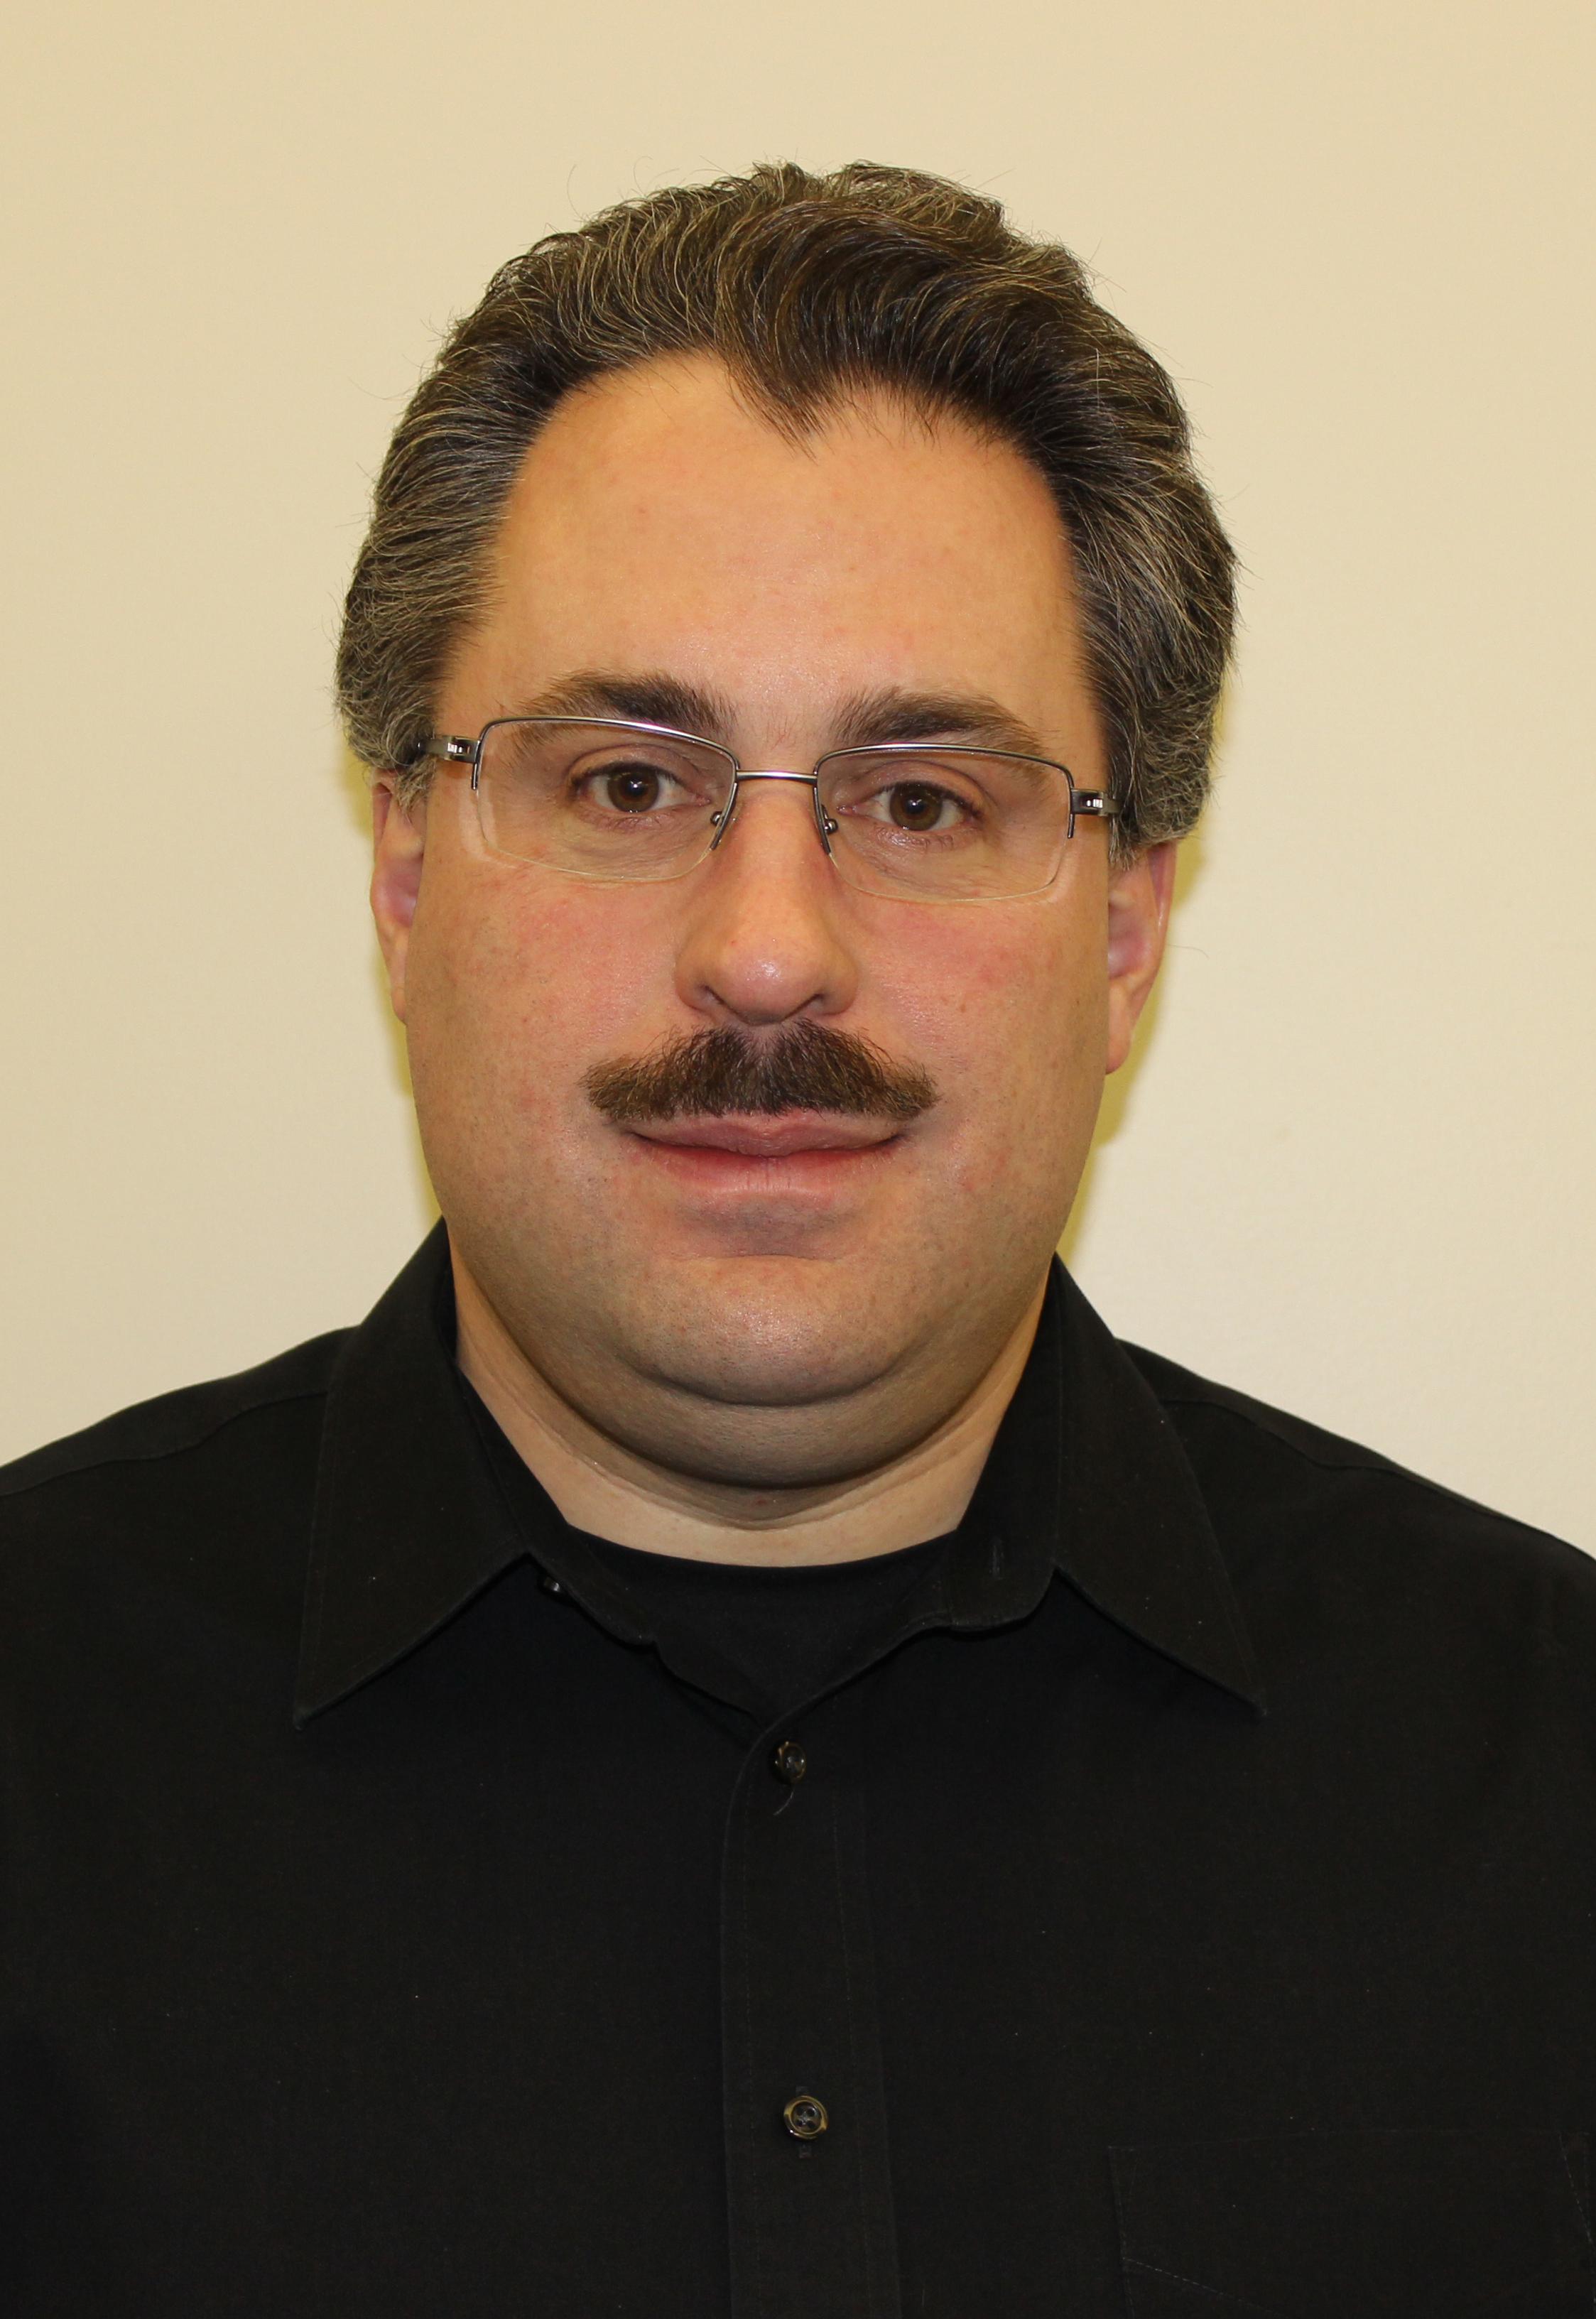 Staff Photo of Michael Paestella